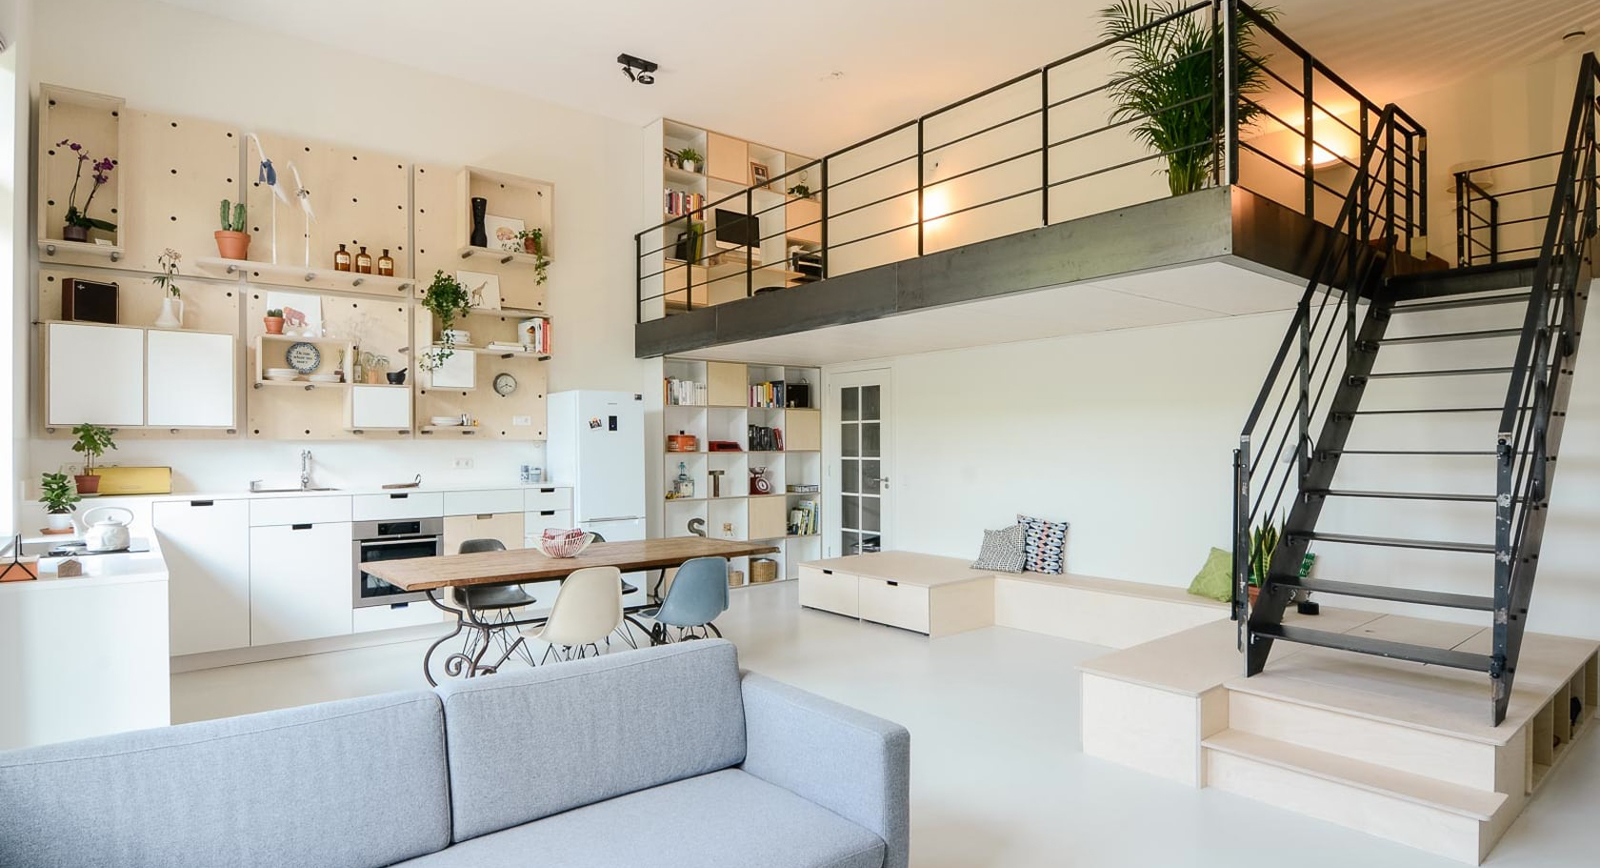 Ons Dorp Amsterdam Loft Conversion